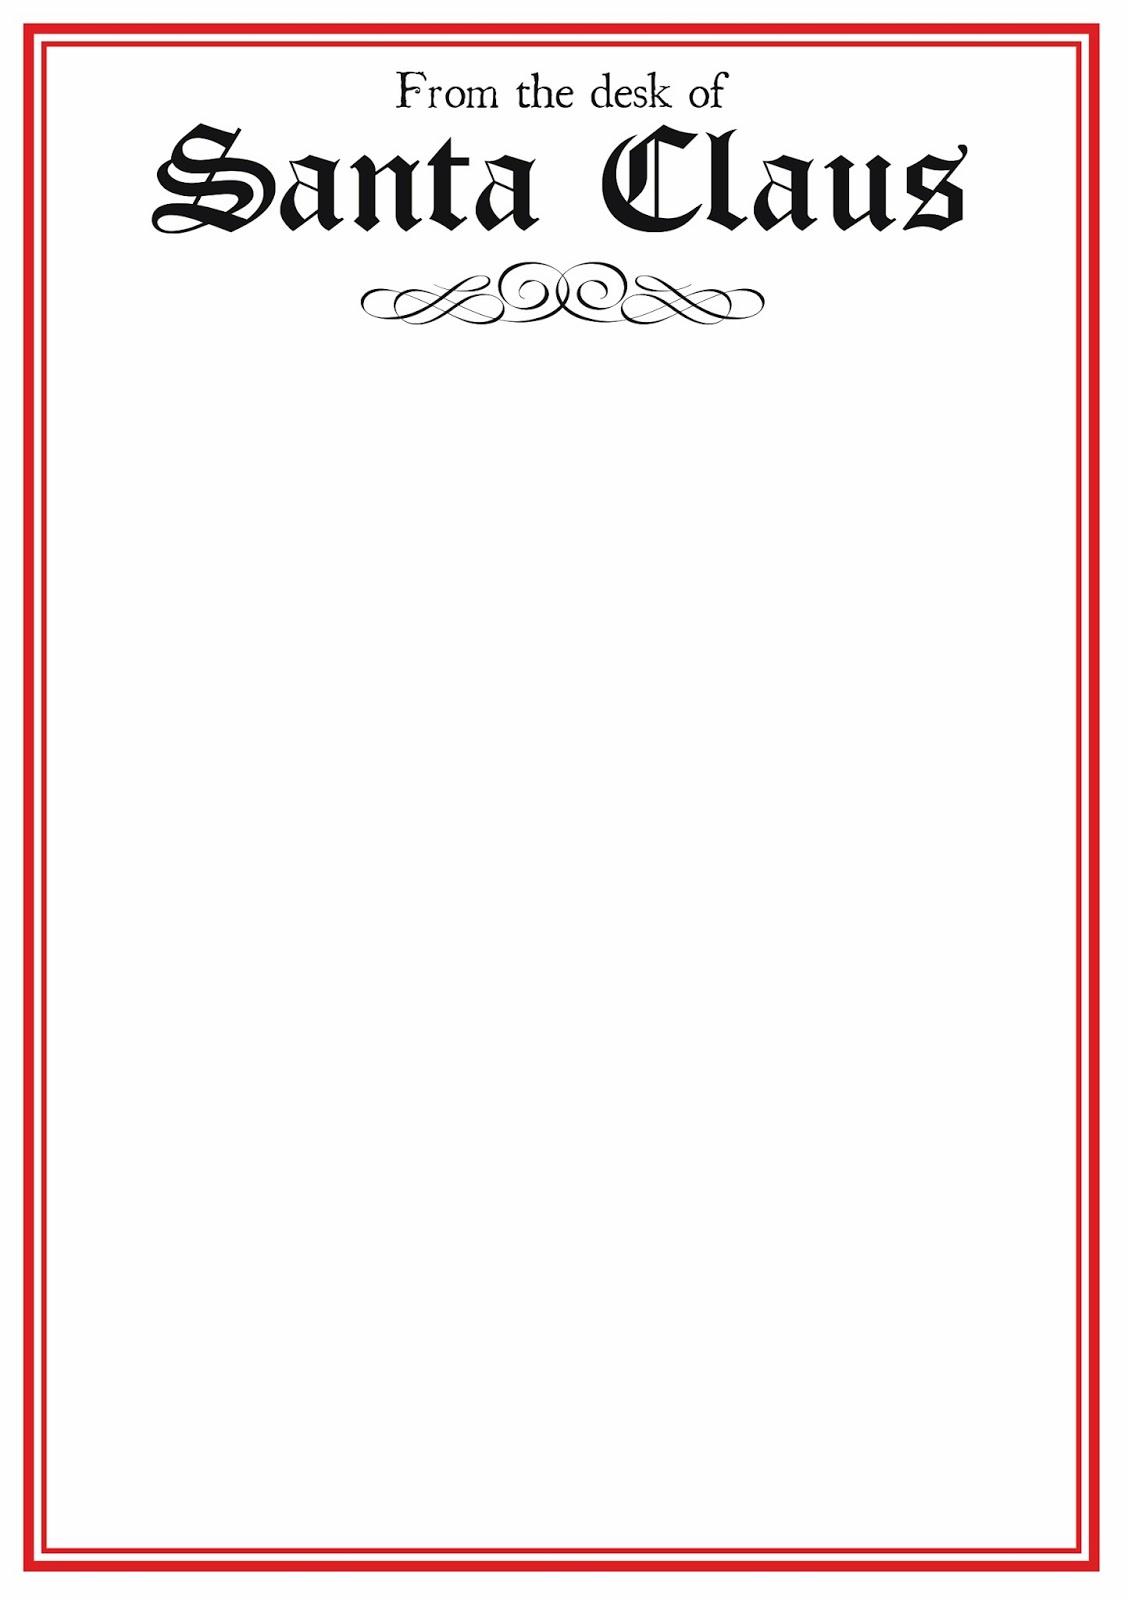 Santa Letter Template Printable - Word Santa Letter Template Acurnamedia